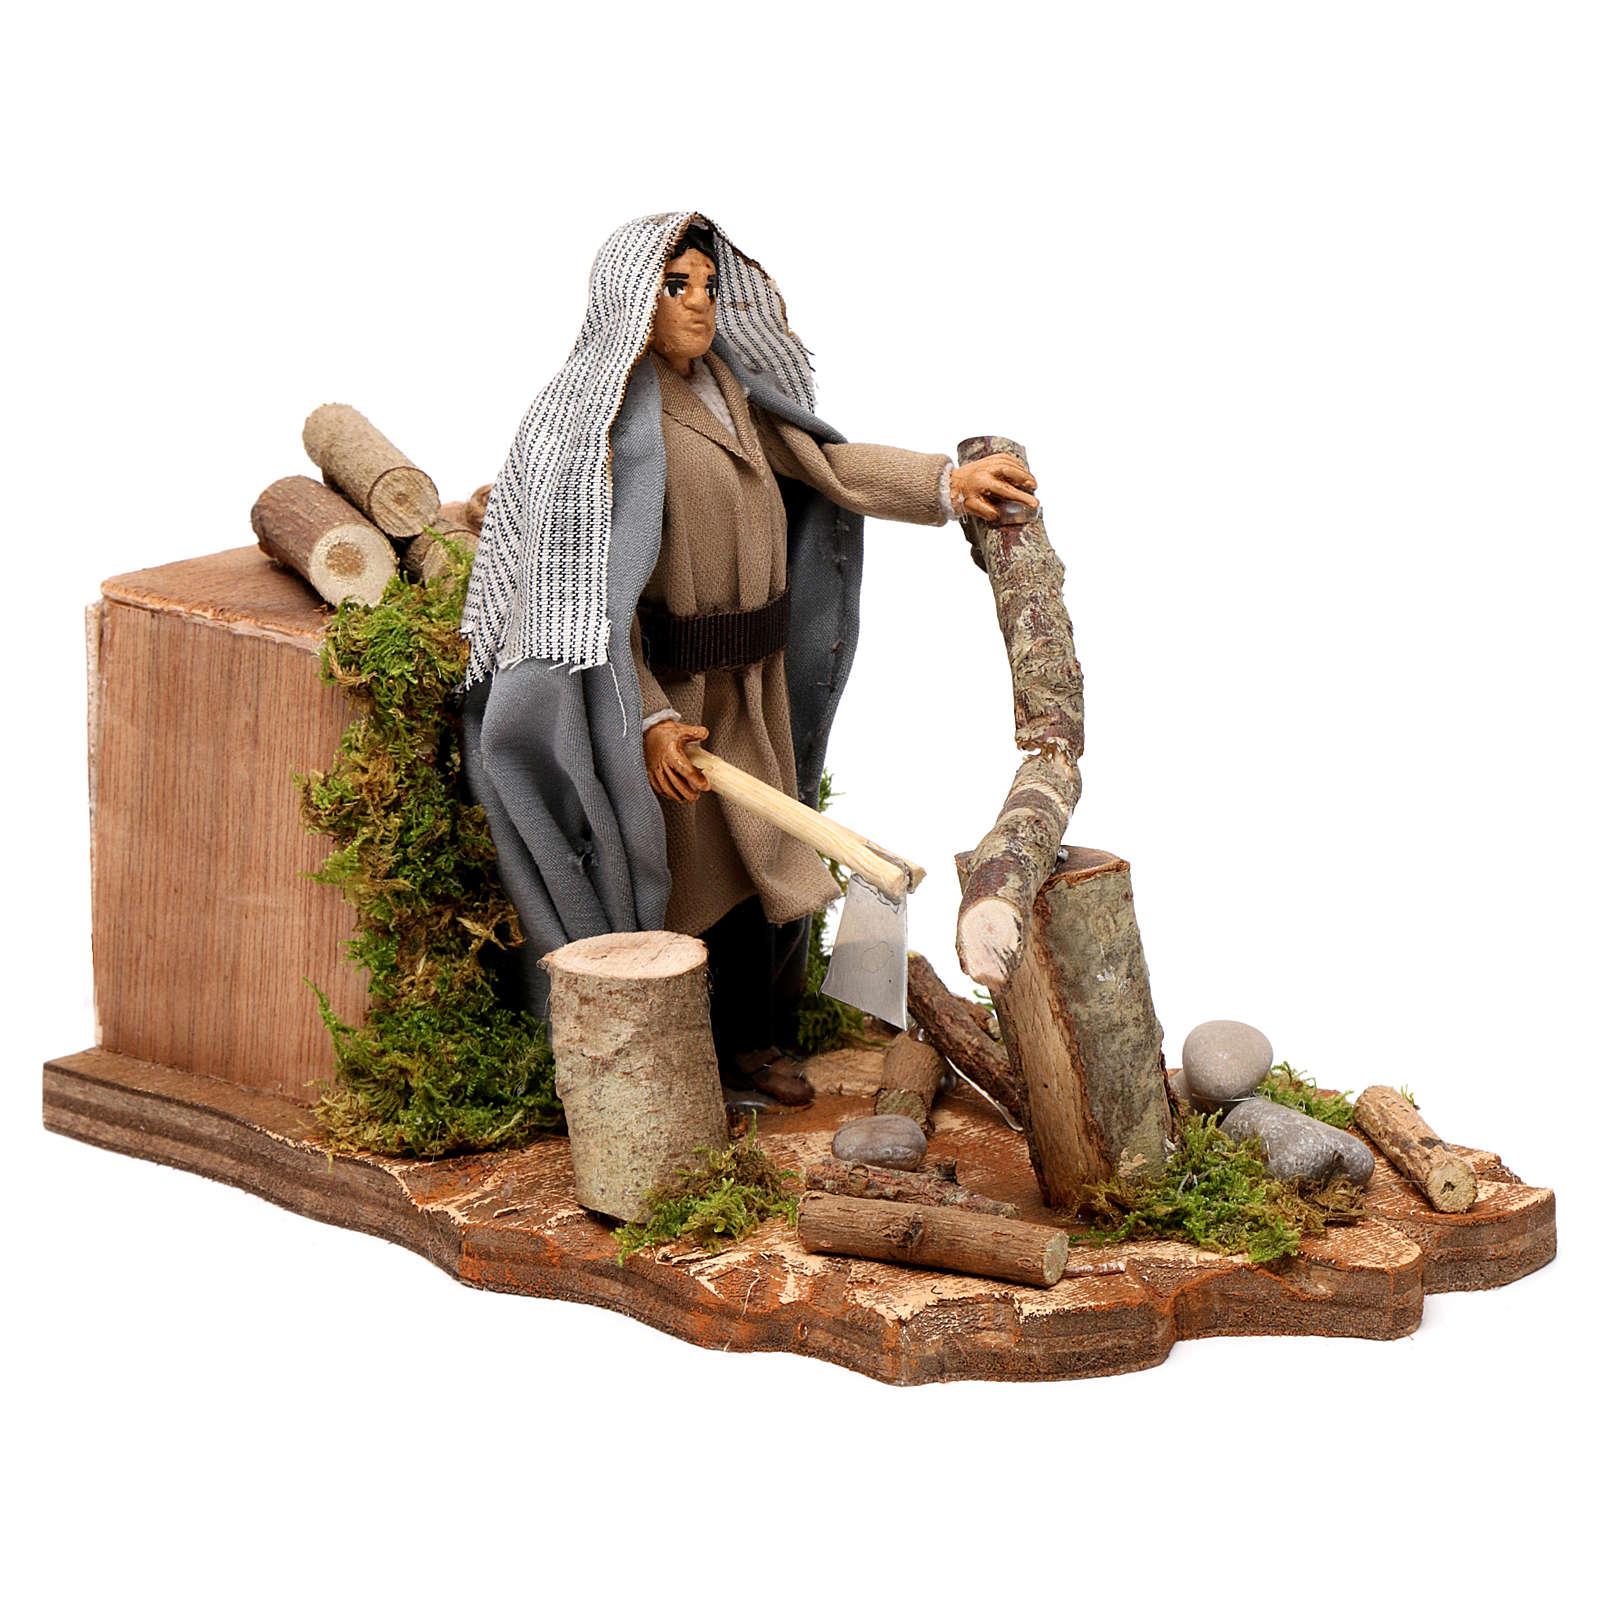 Neapolitan nativity scene wood cutter with ax 14 cm 4